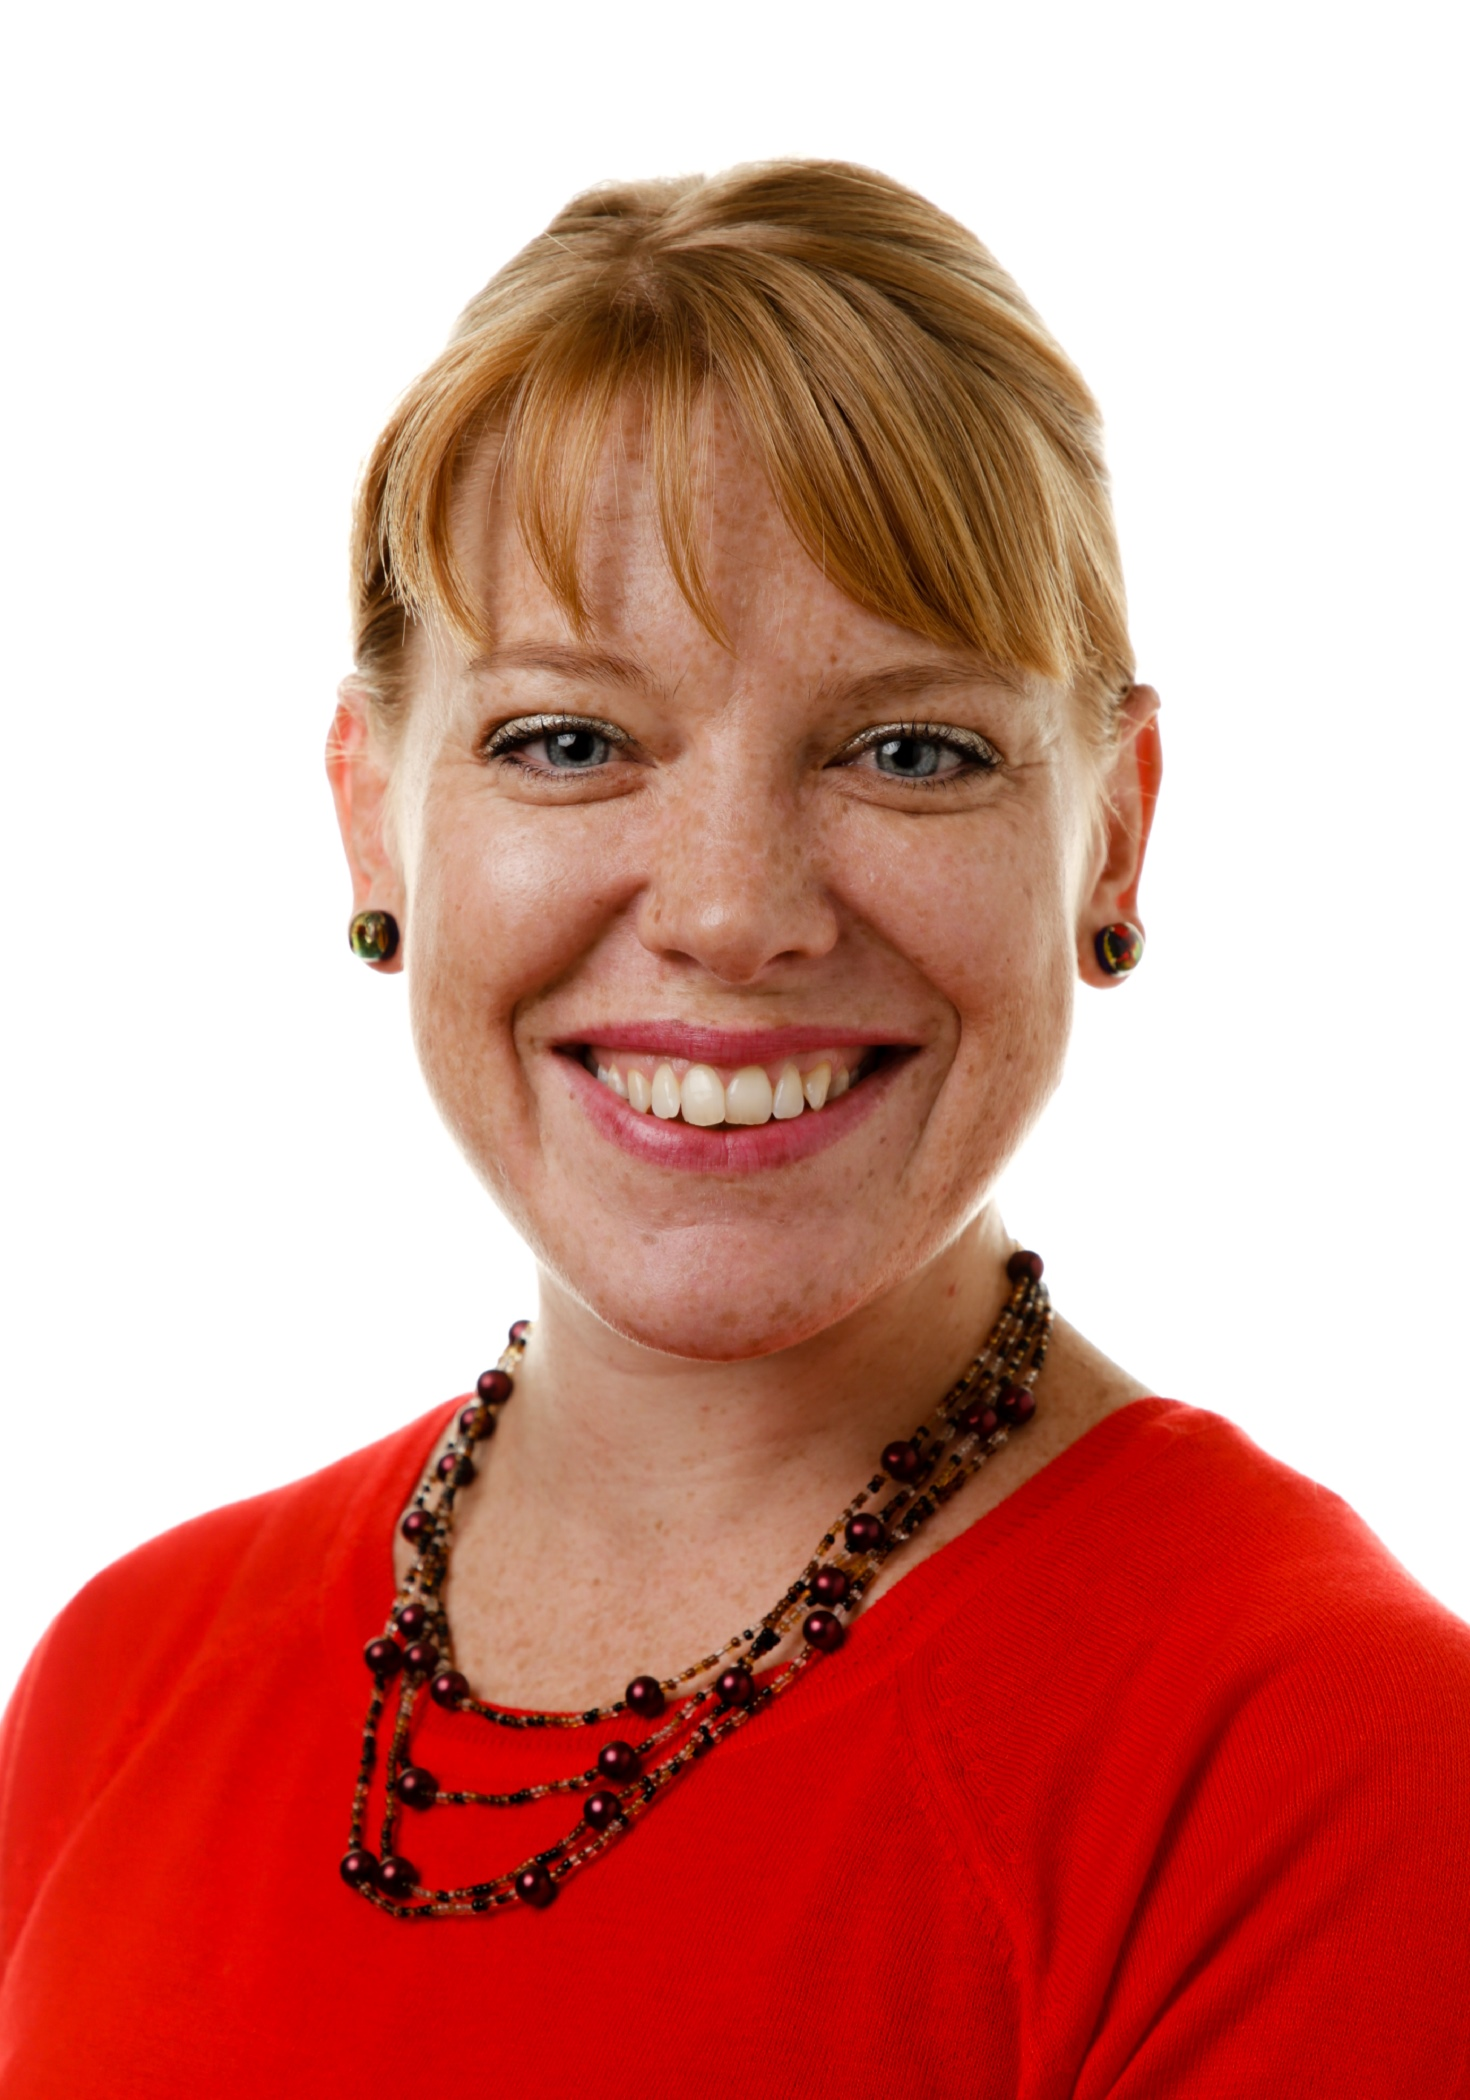 Pædagog, Marie Kronow